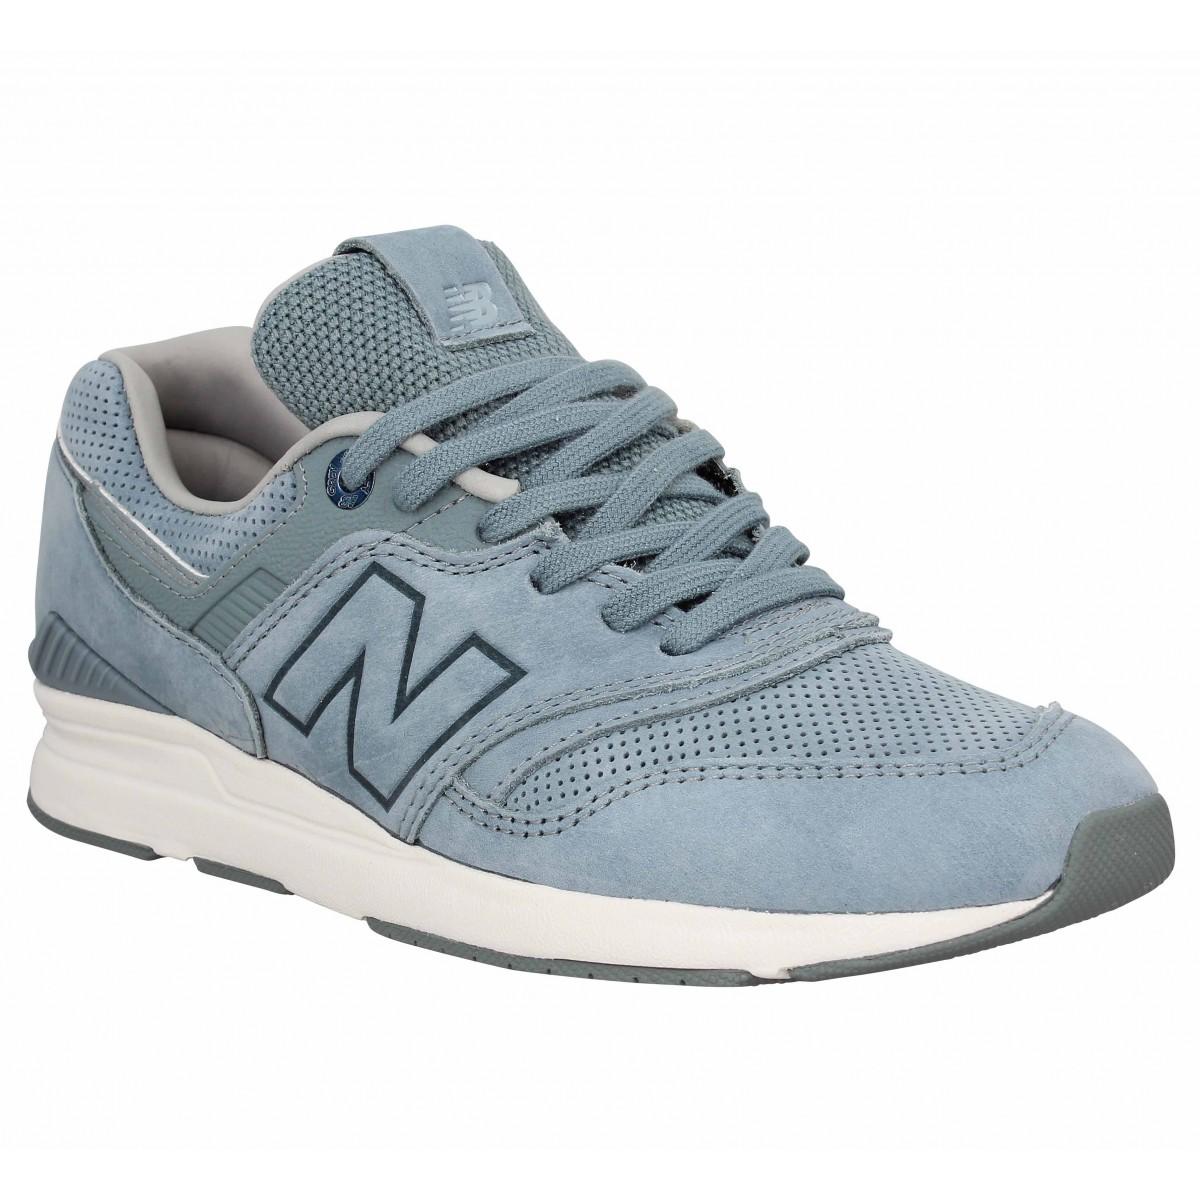 New Balance Femme Wl 697 Nubuck -38-bleu